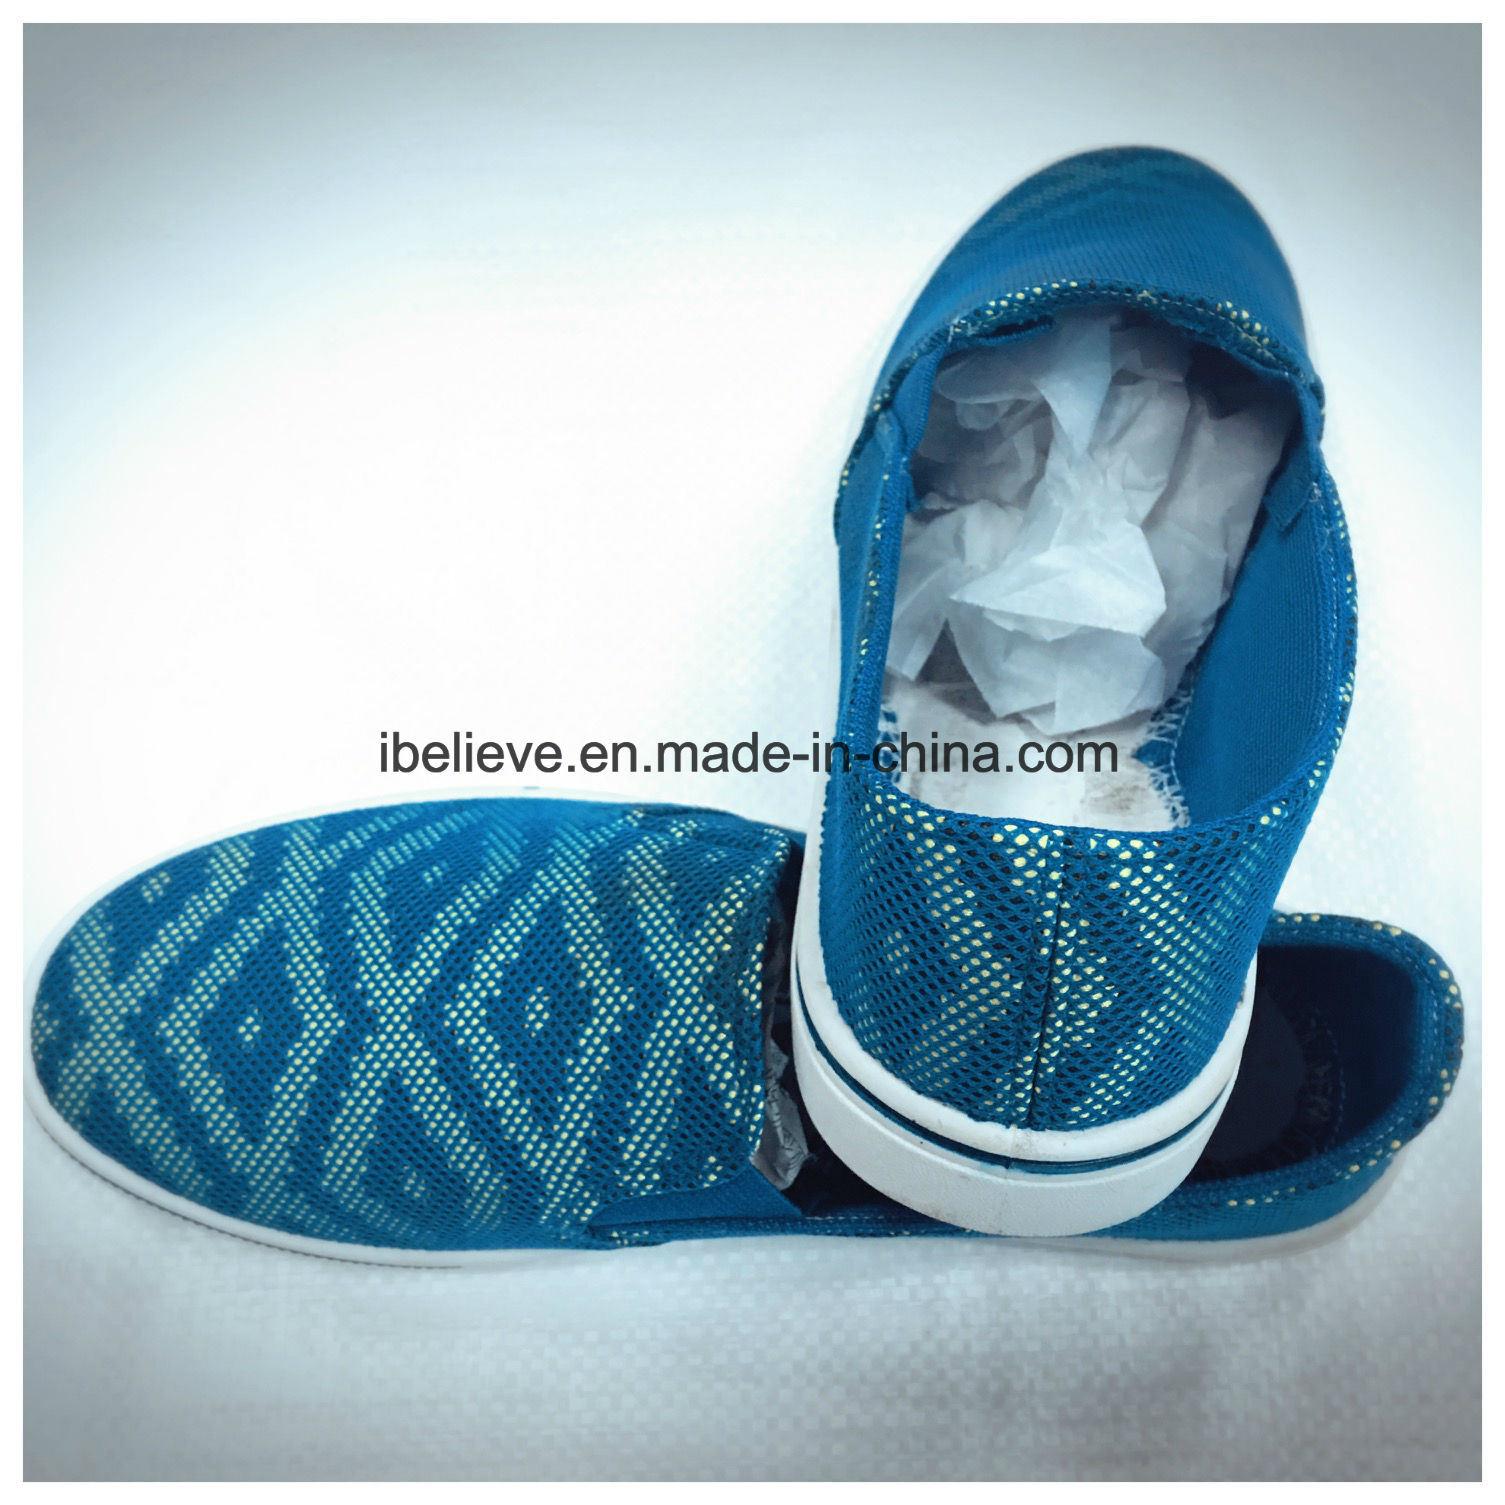 Summer Wear Mesh Comfortable Shoes